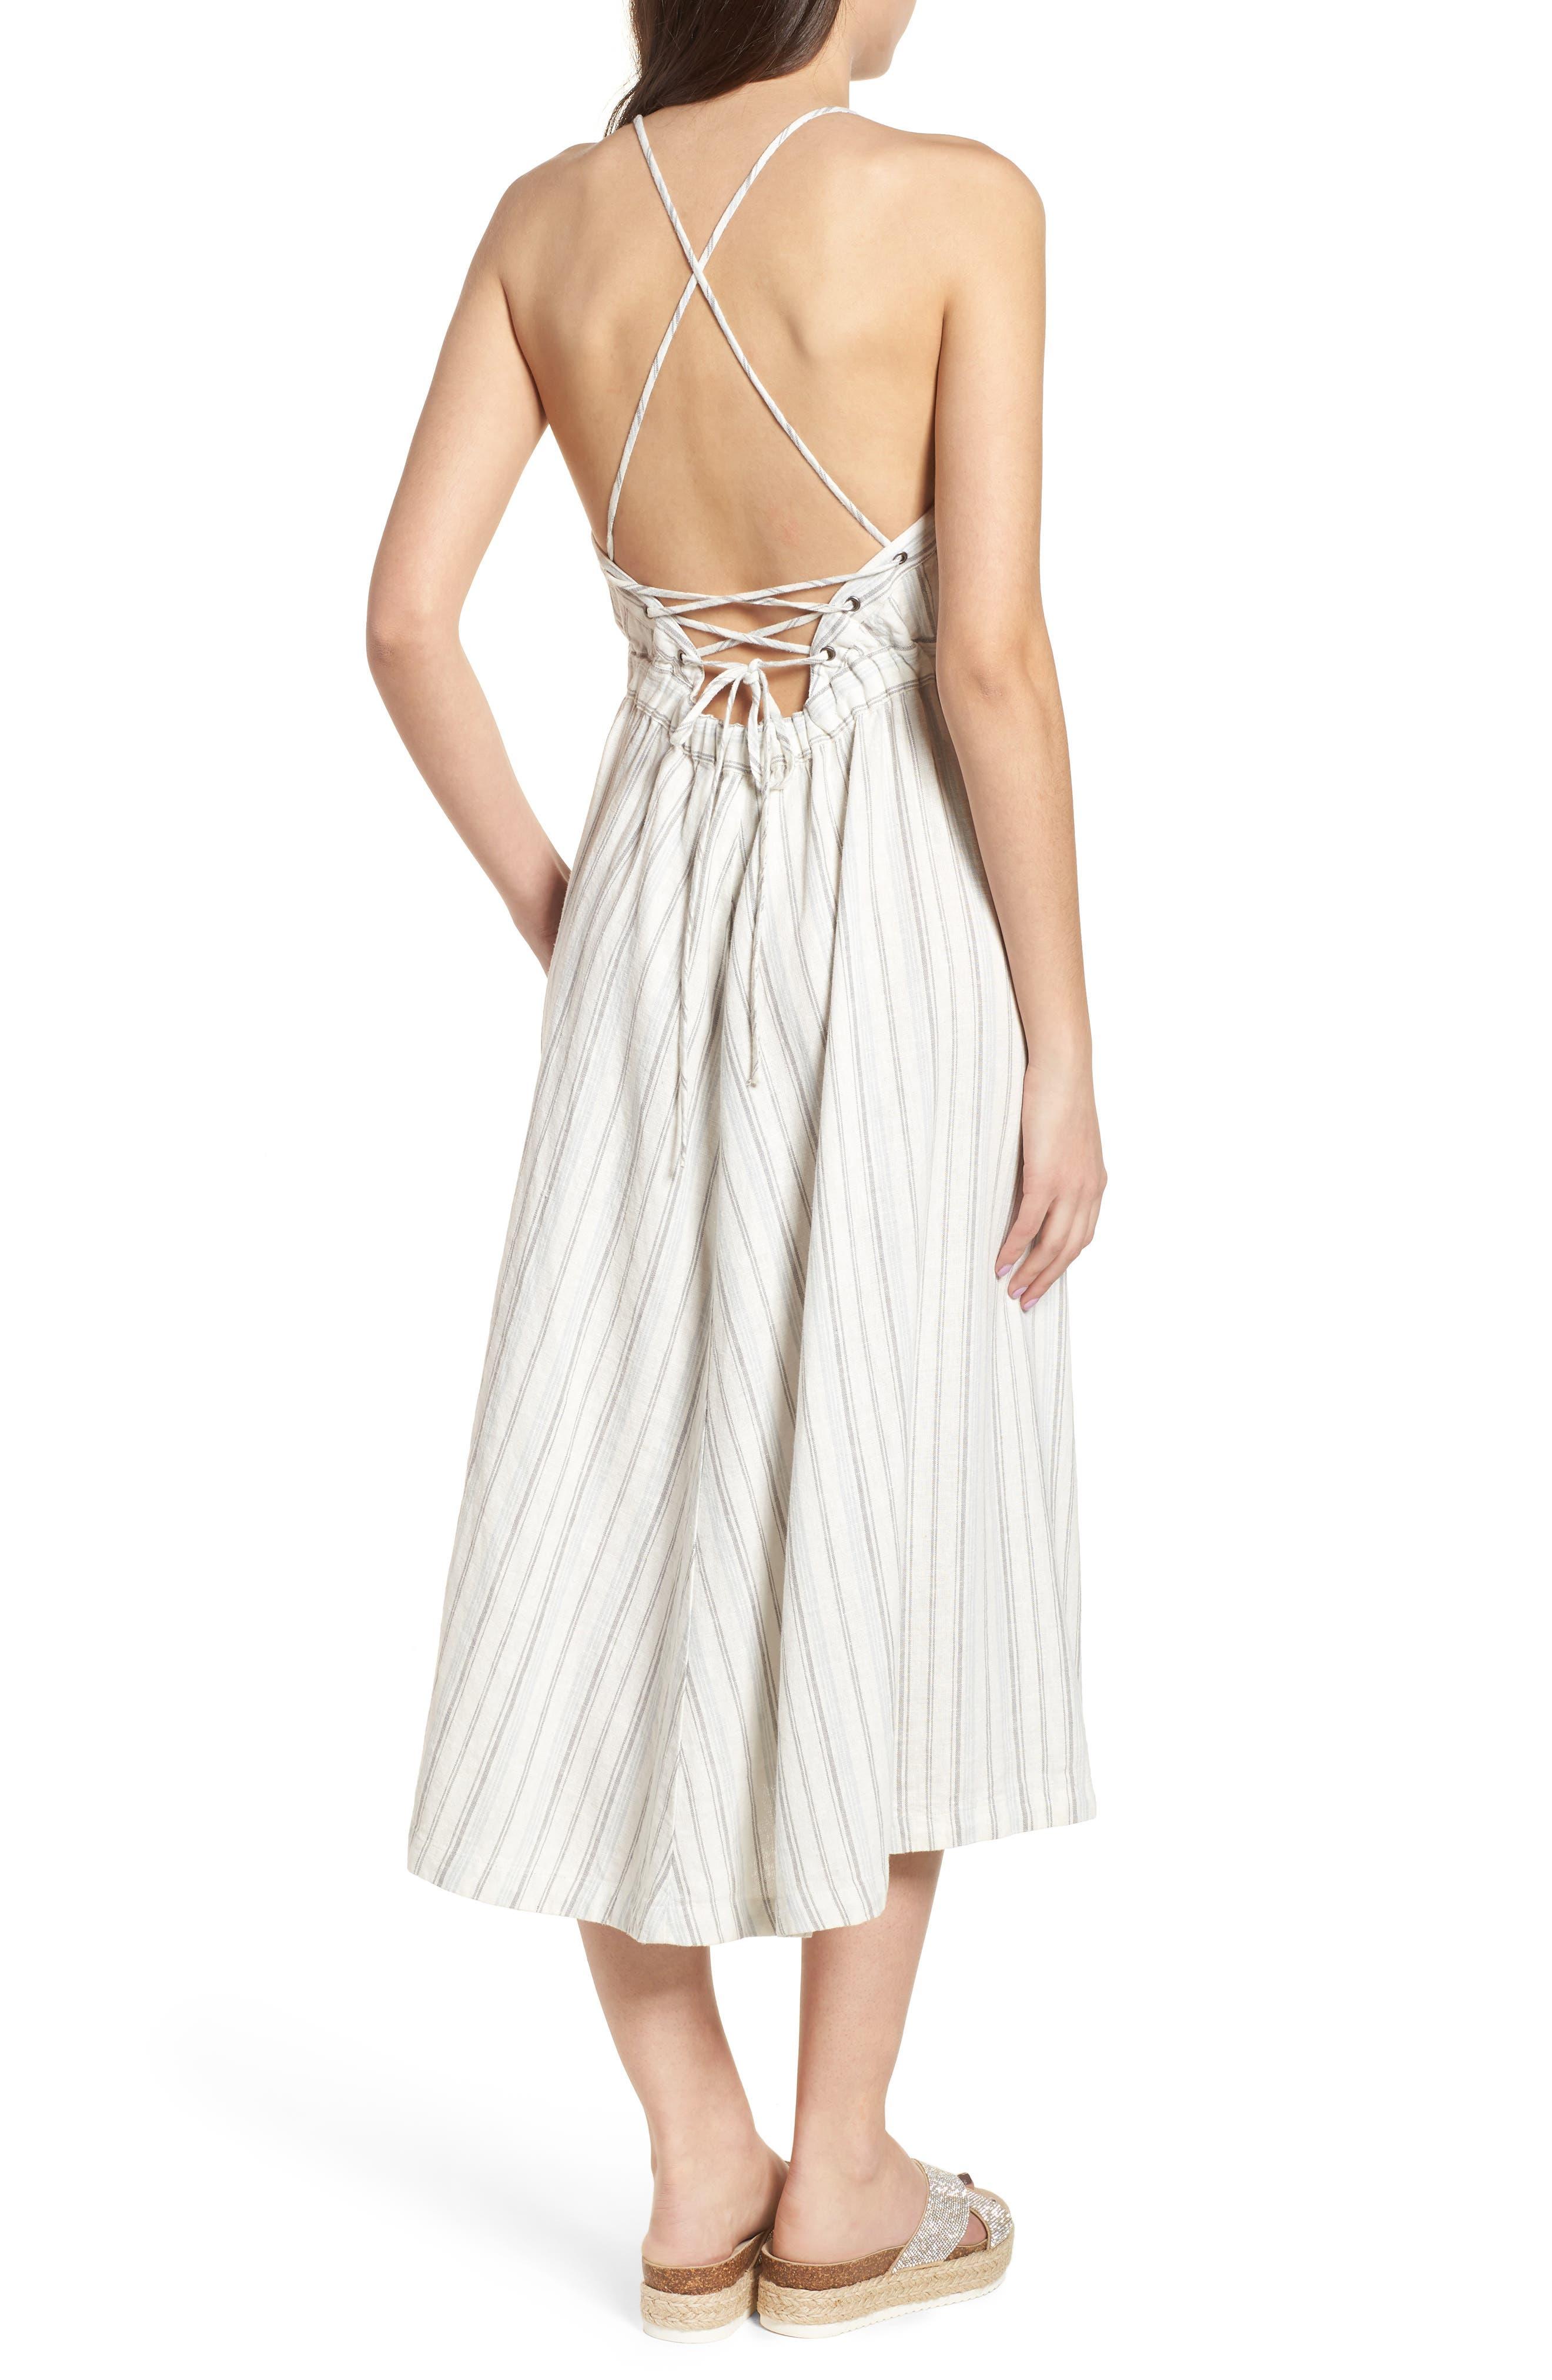 Stripe Apron Dress,                             Alternate thumbnail 2, color,                             Ivory Verigated Stripe